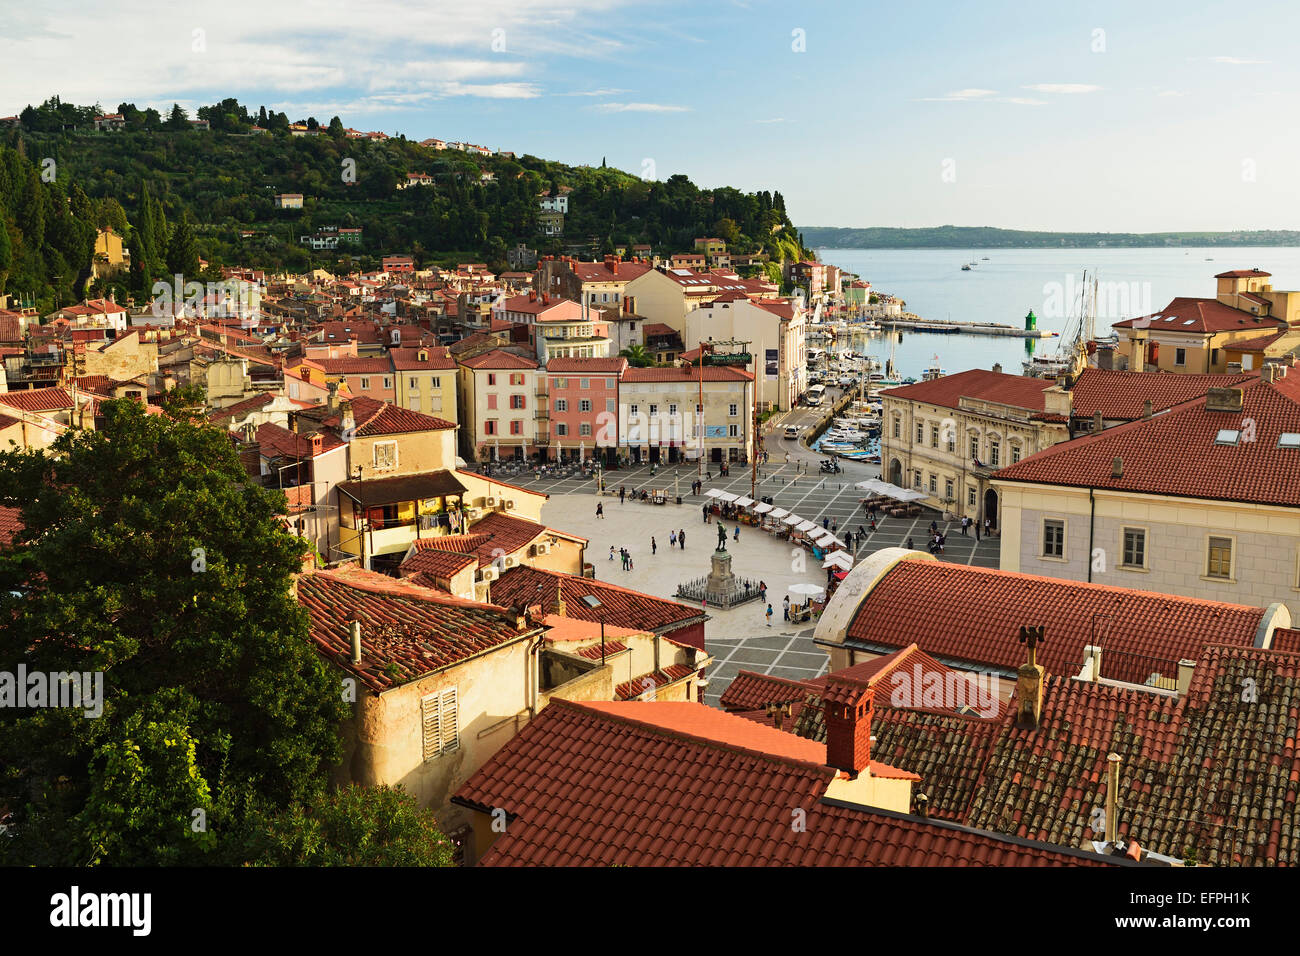 Piran, Gulf of Piran, Adriatic Sea, Slovenia, Europe - Stock Image